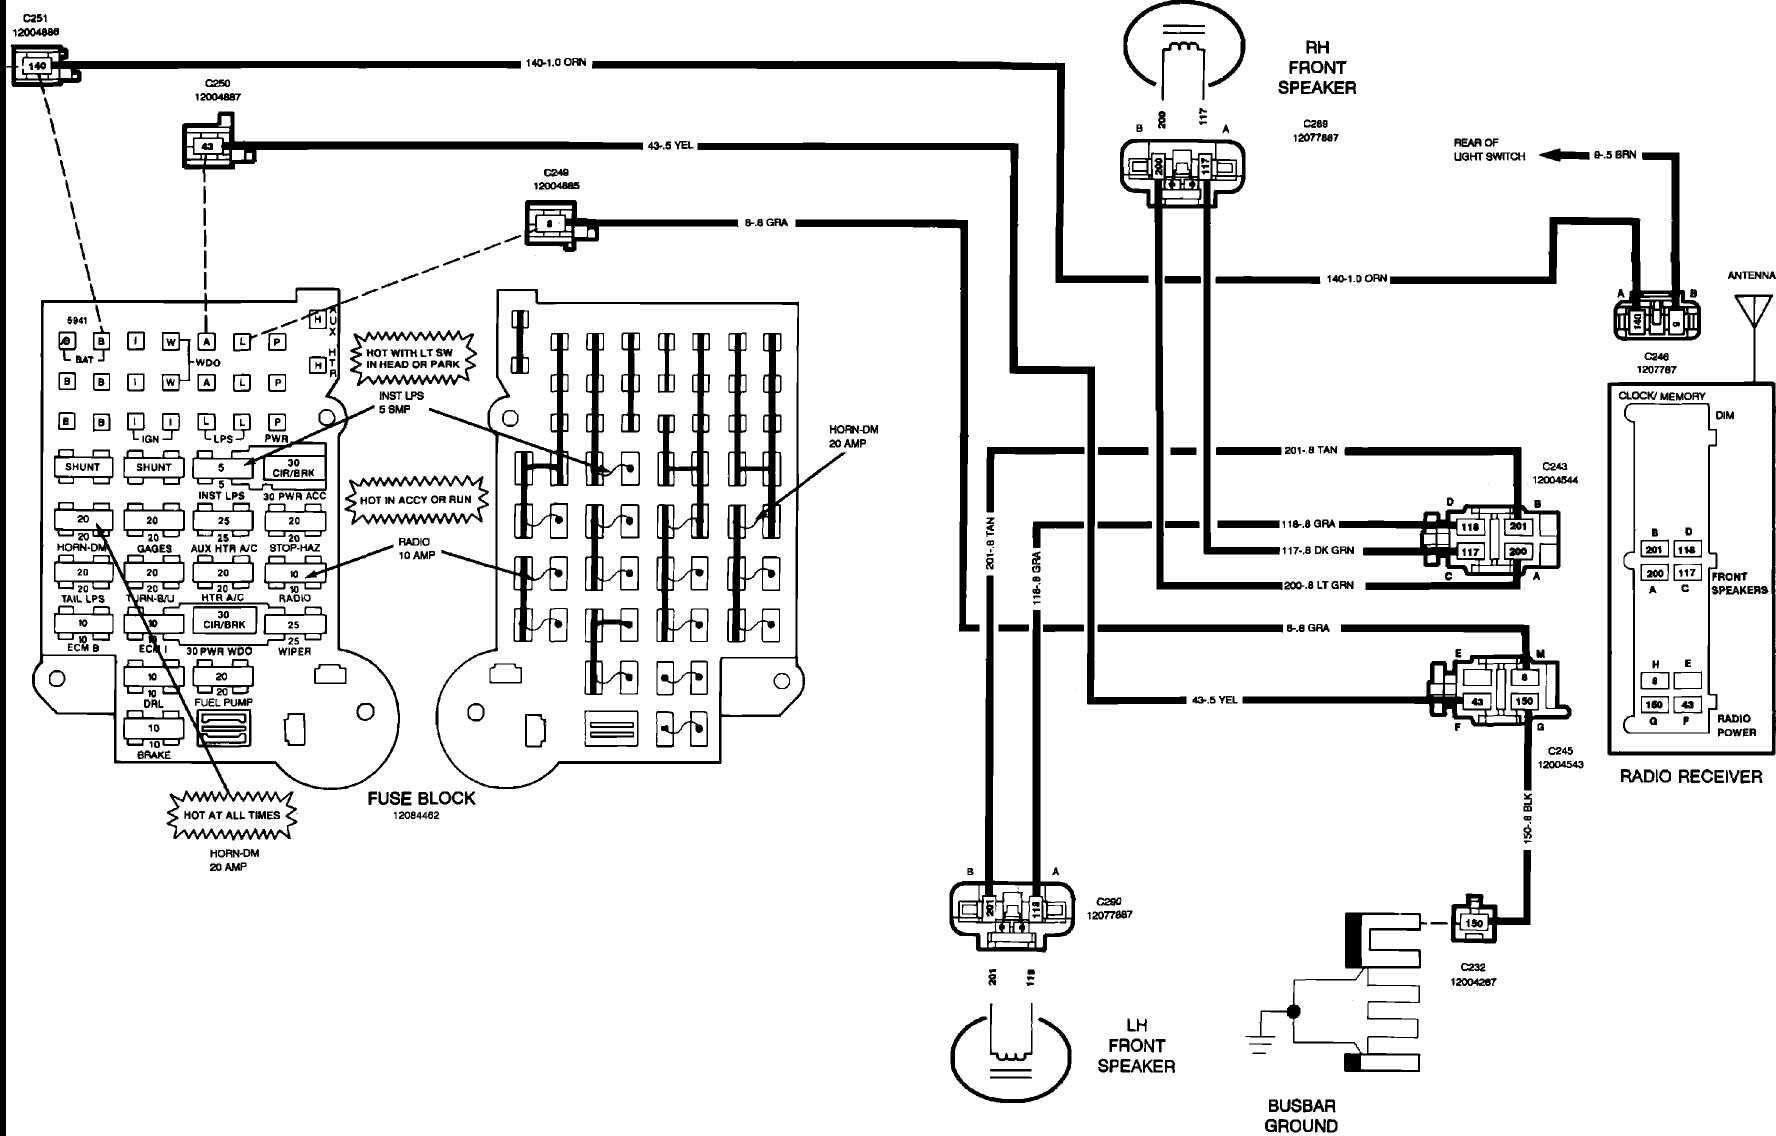 1979 Chevy Cargo Van Fuse Box Diagram | Wiring Diagram - Chevy 350 Wiring Diagram